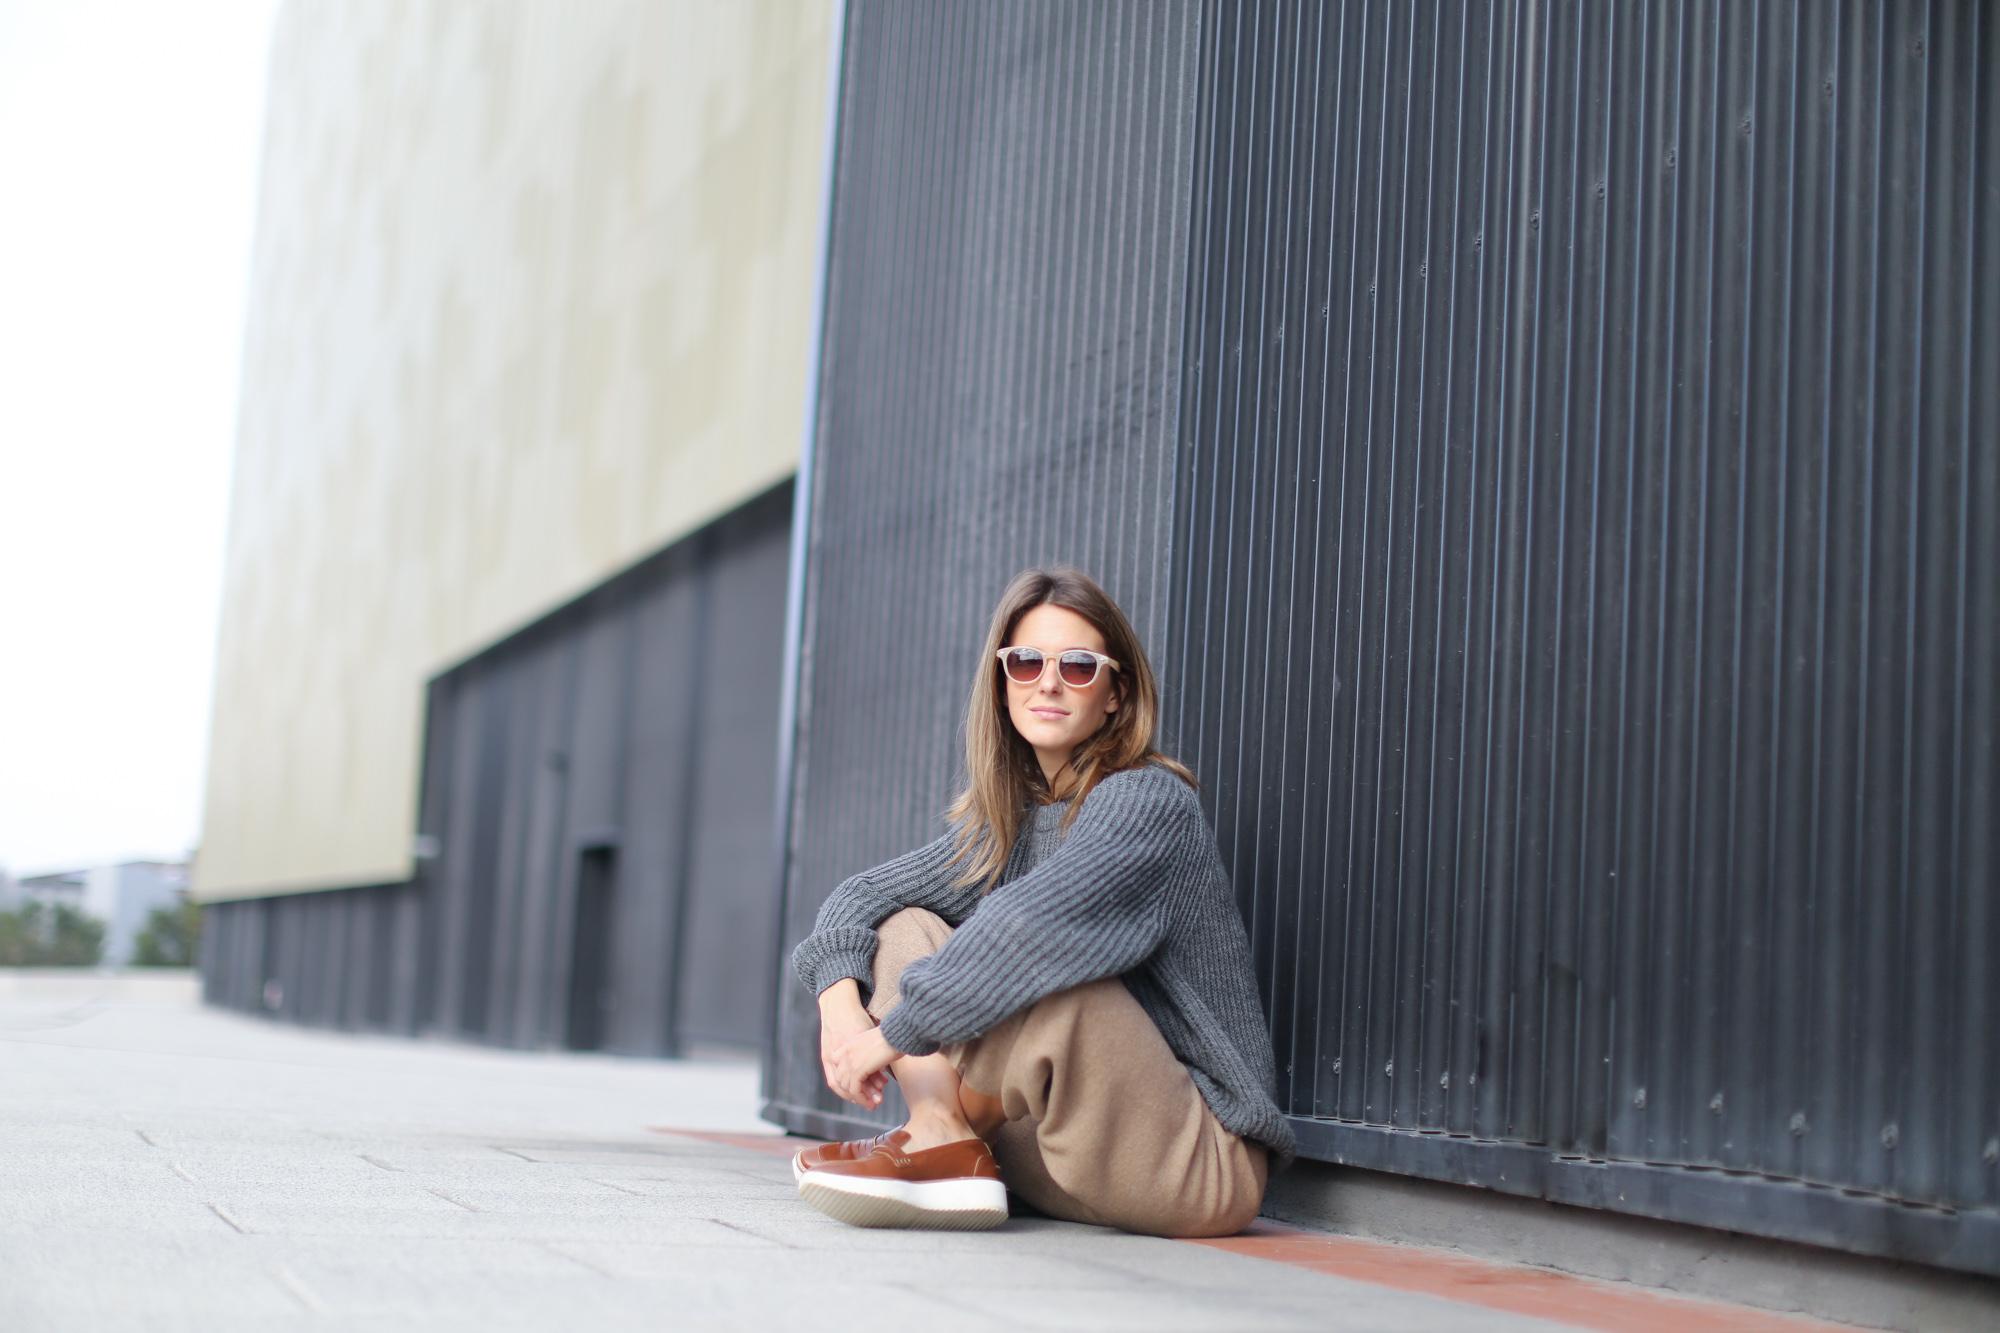 Clochet-streetstyle-zara-beige-wool-culottes-grey-chunky-knit-11